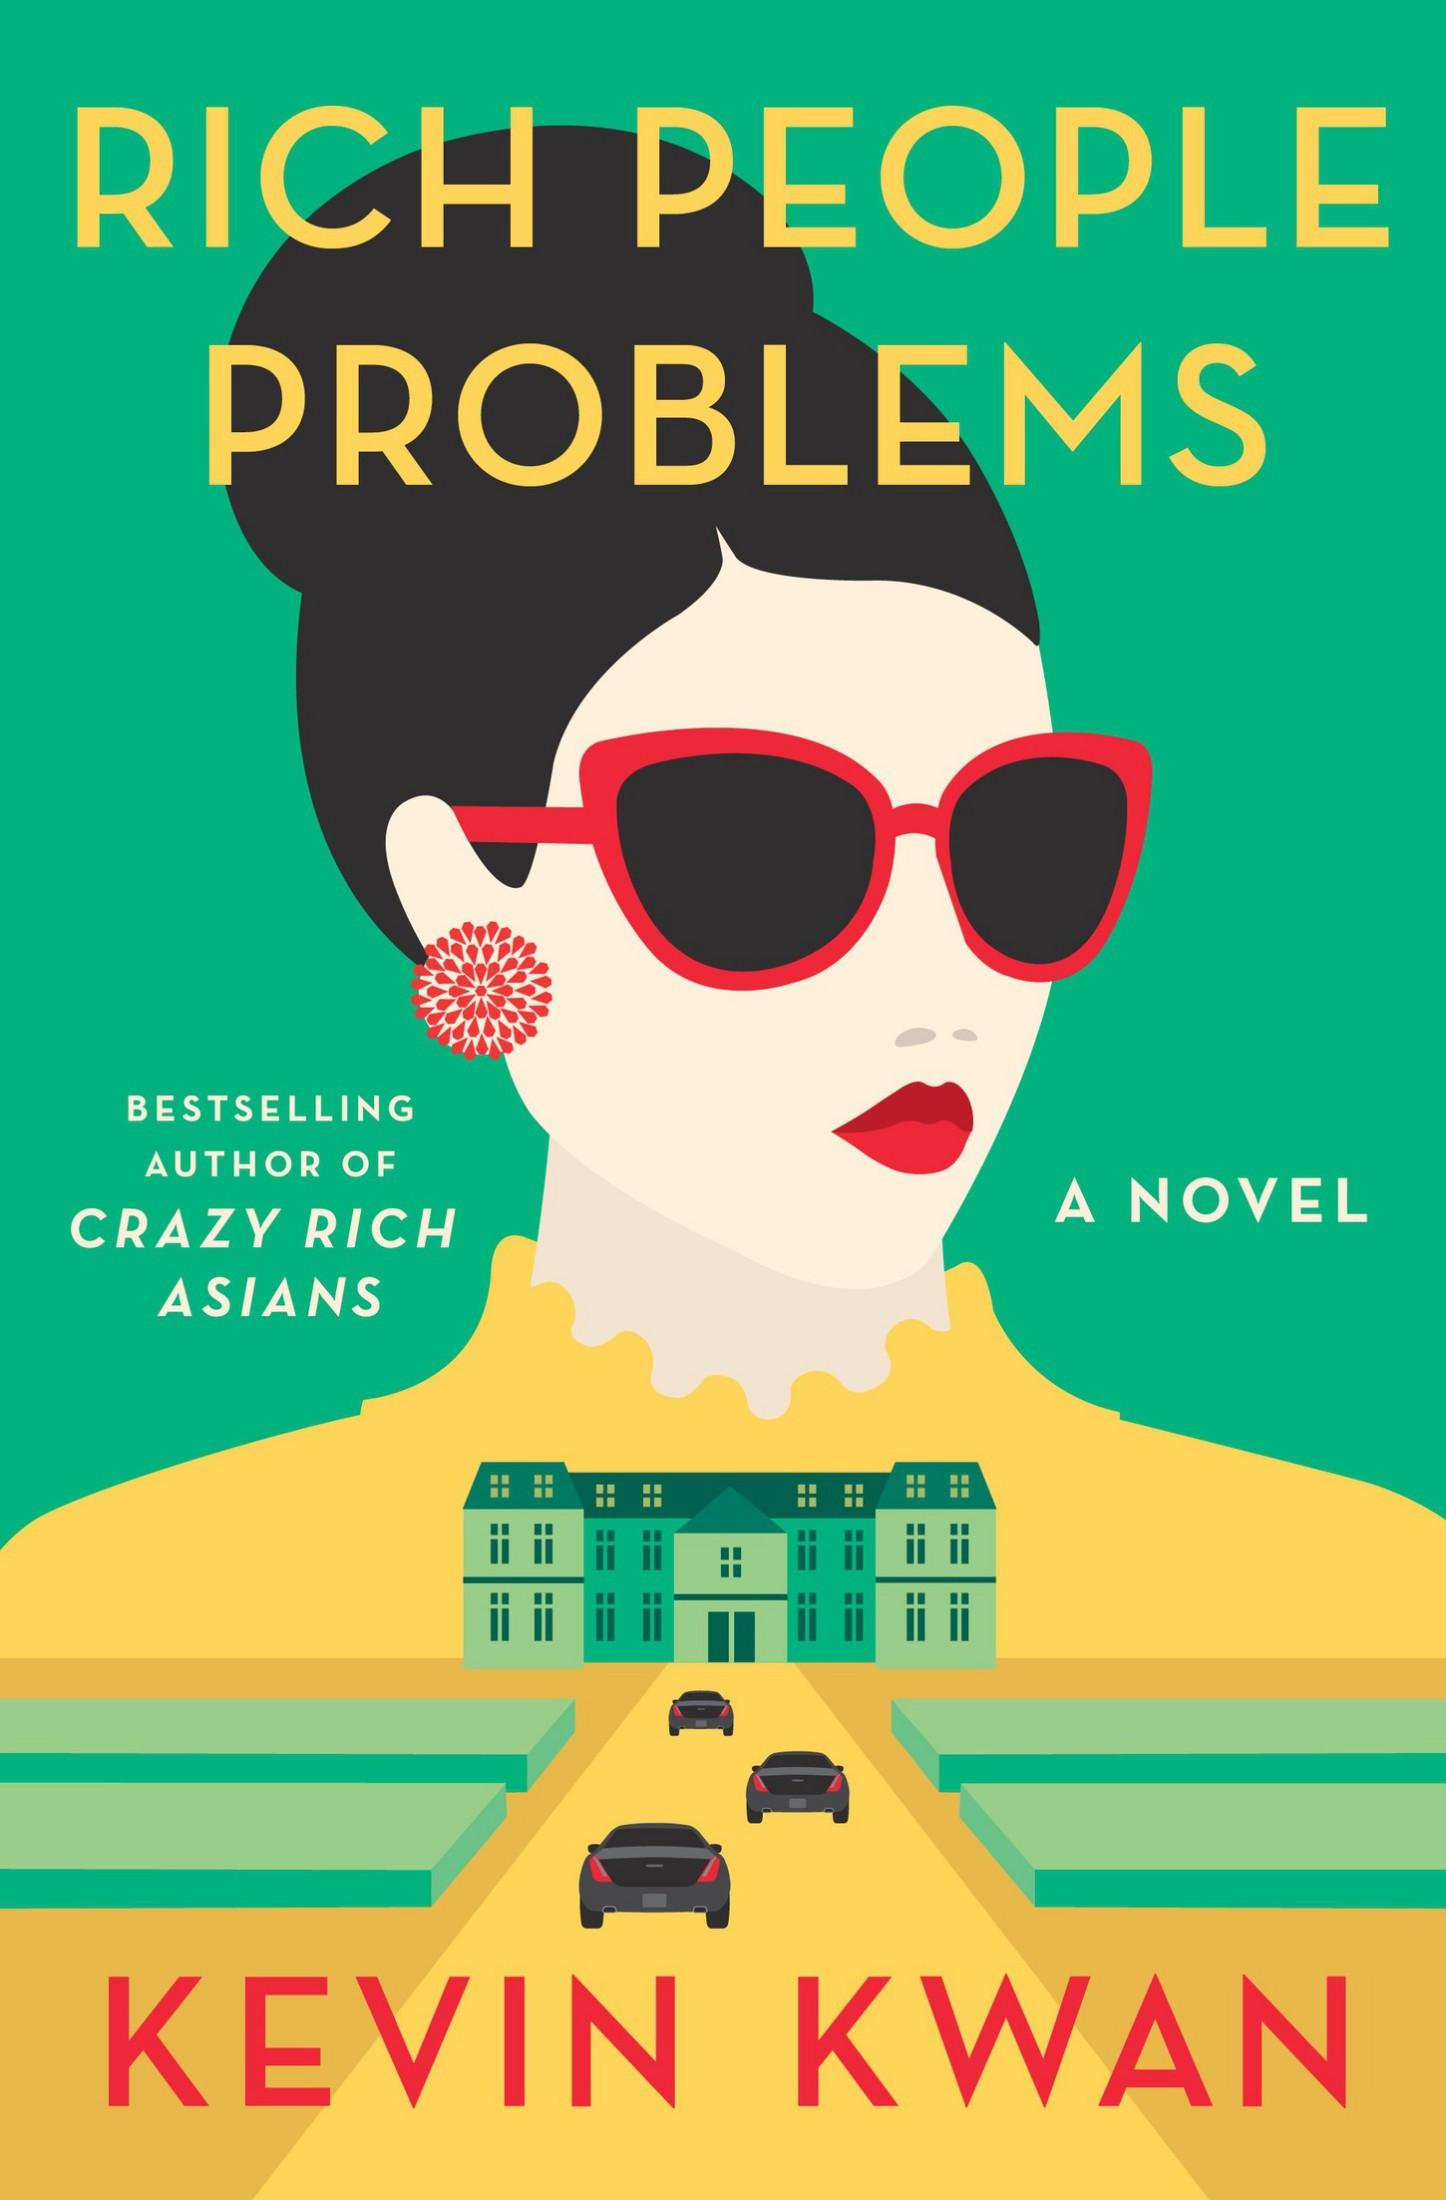 Rich People Problems (Crazy Rich Asians Trilogy) - Kevin Kwan [kindle] [mobi]